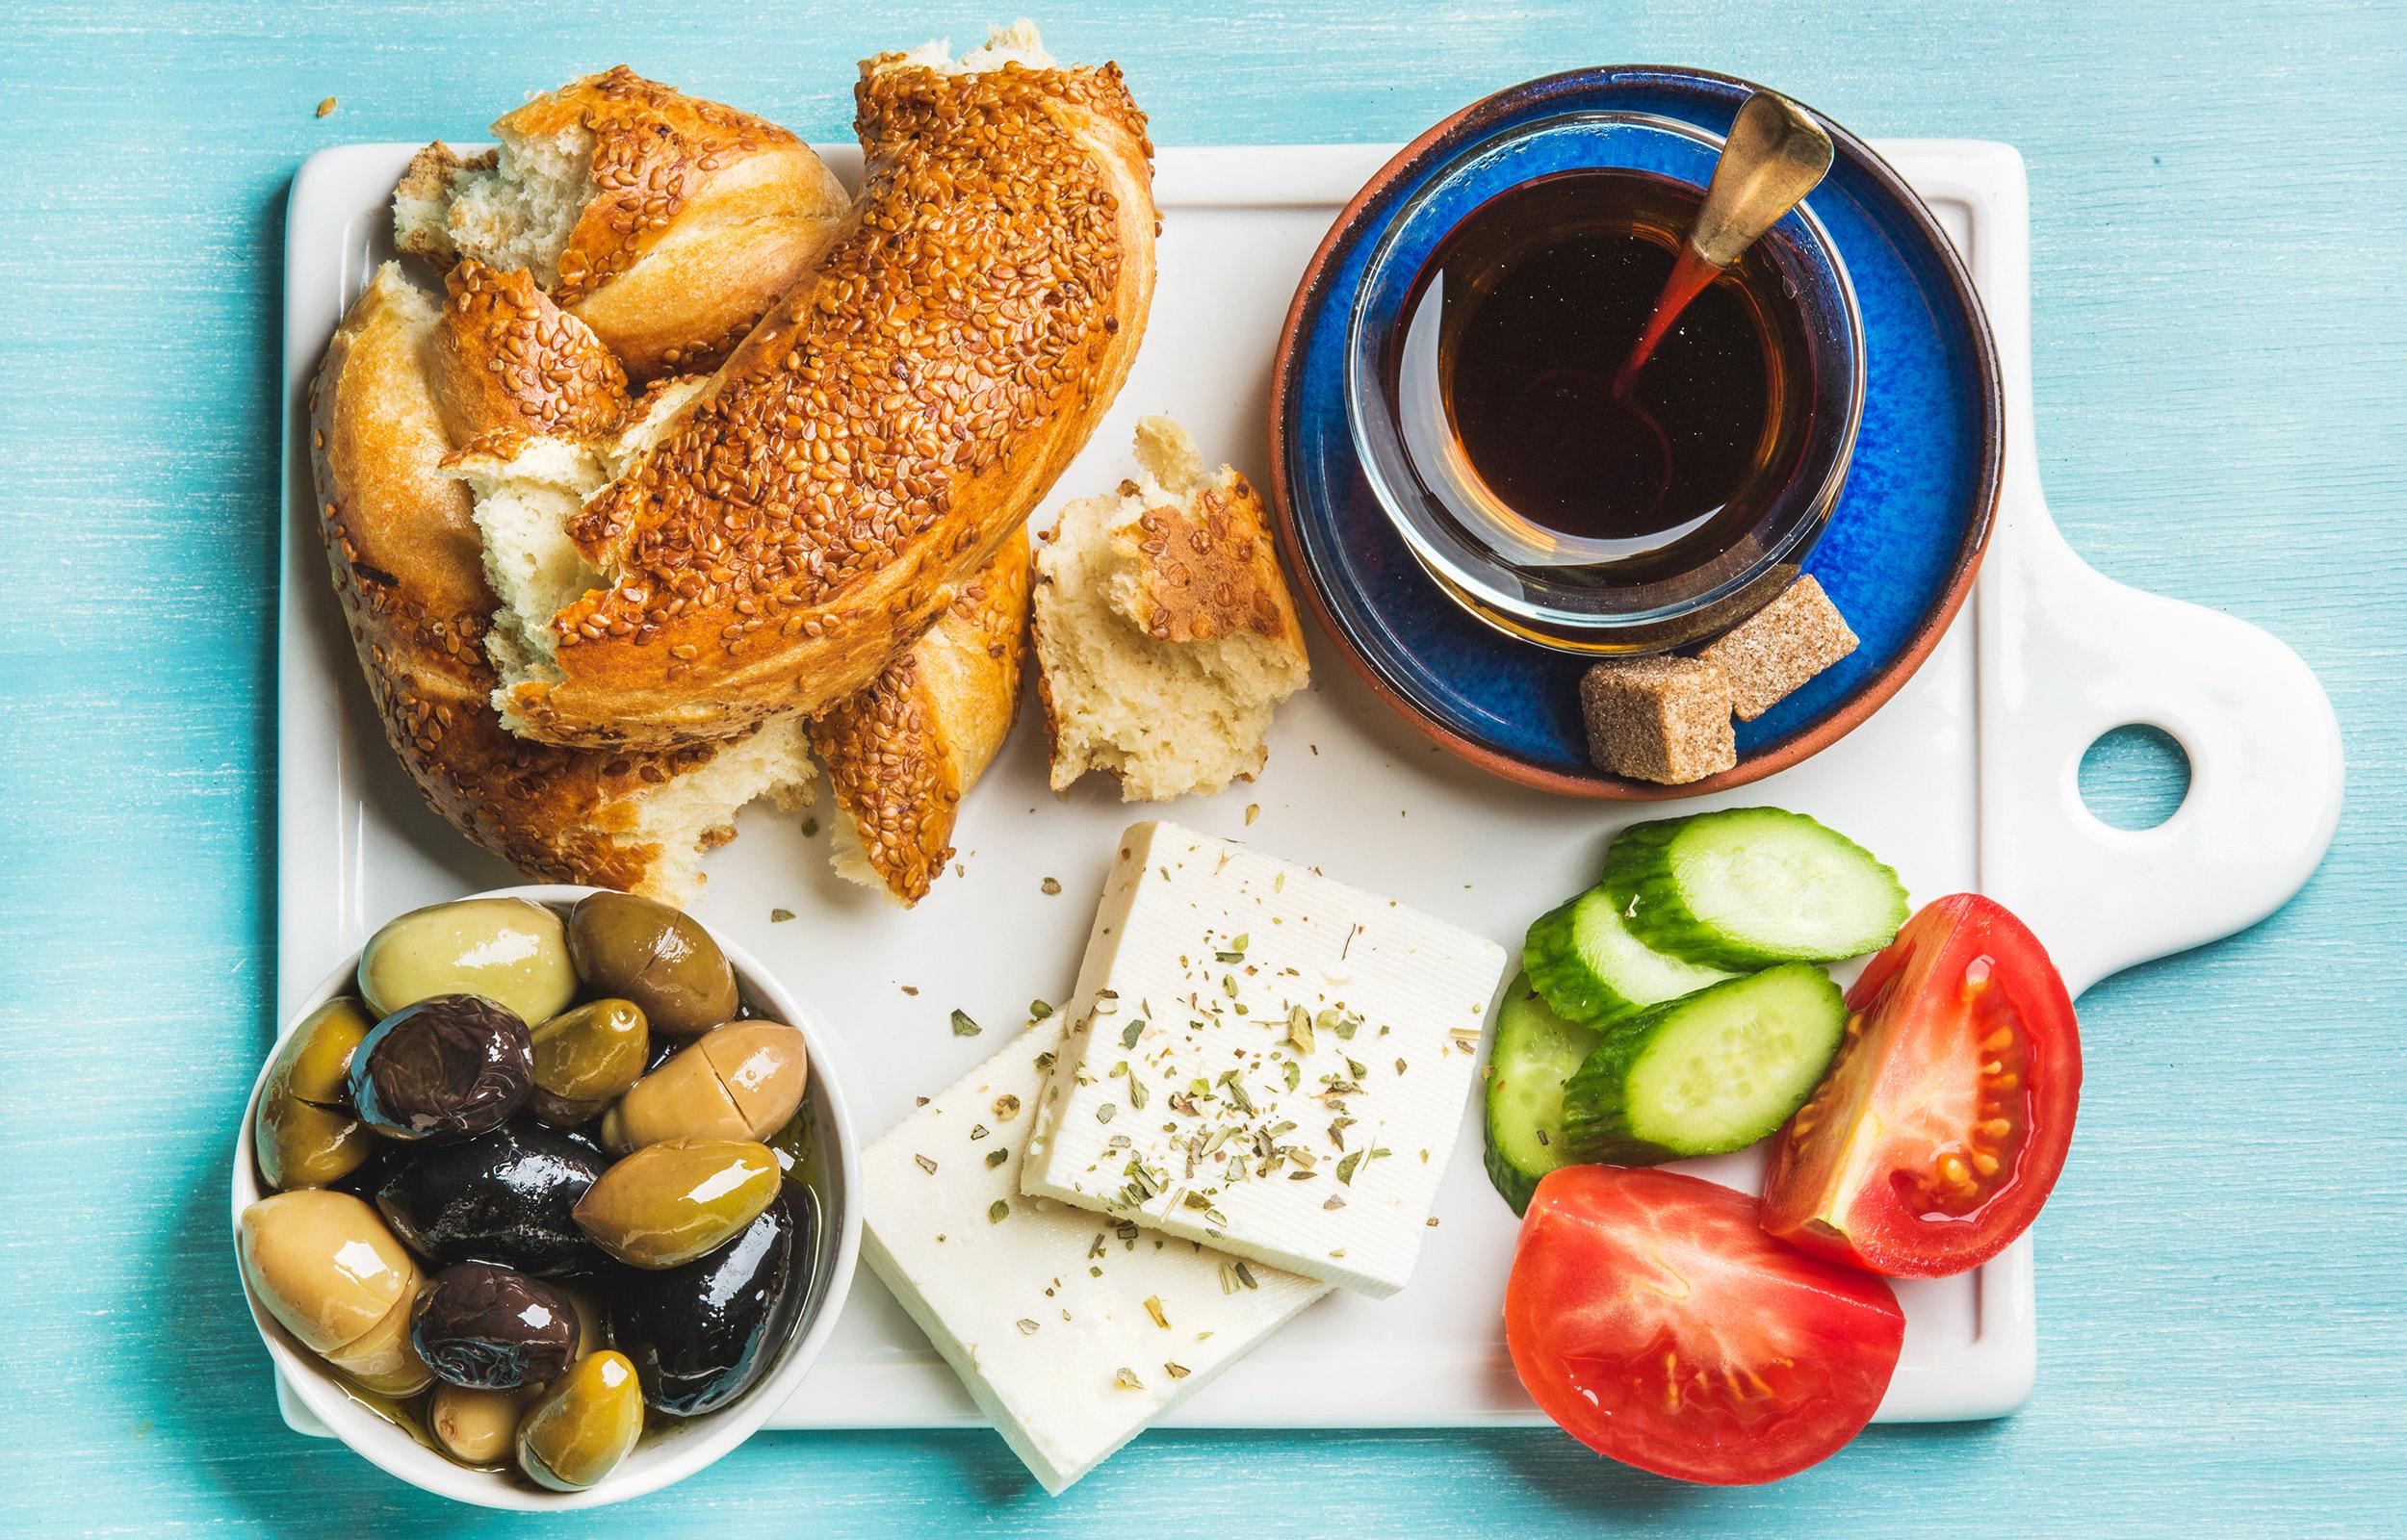 7 Mediterranean Diet Breakfasts To Make In 30 Minutes Or Less